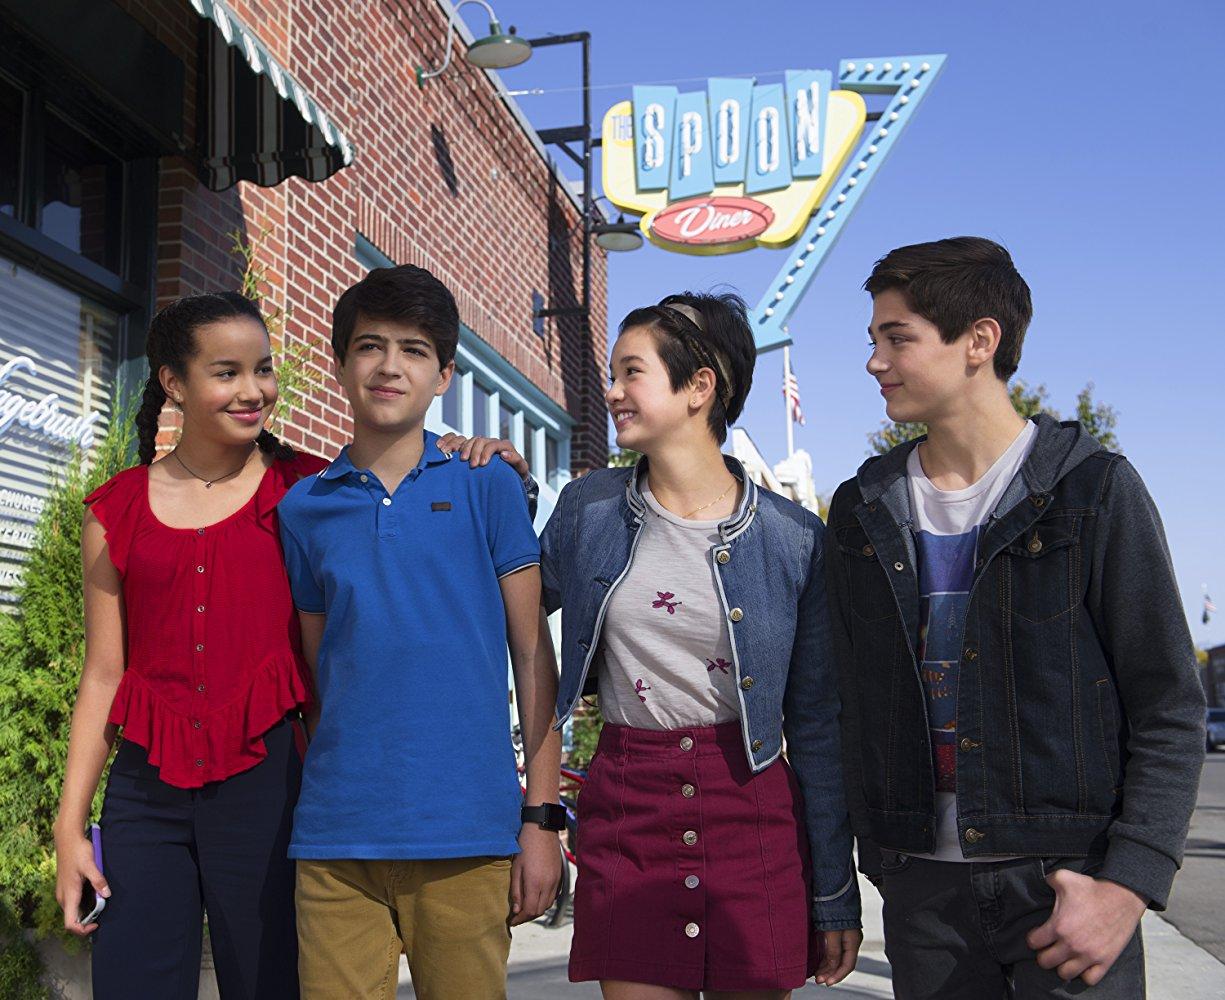 Andi Mack - Season 2